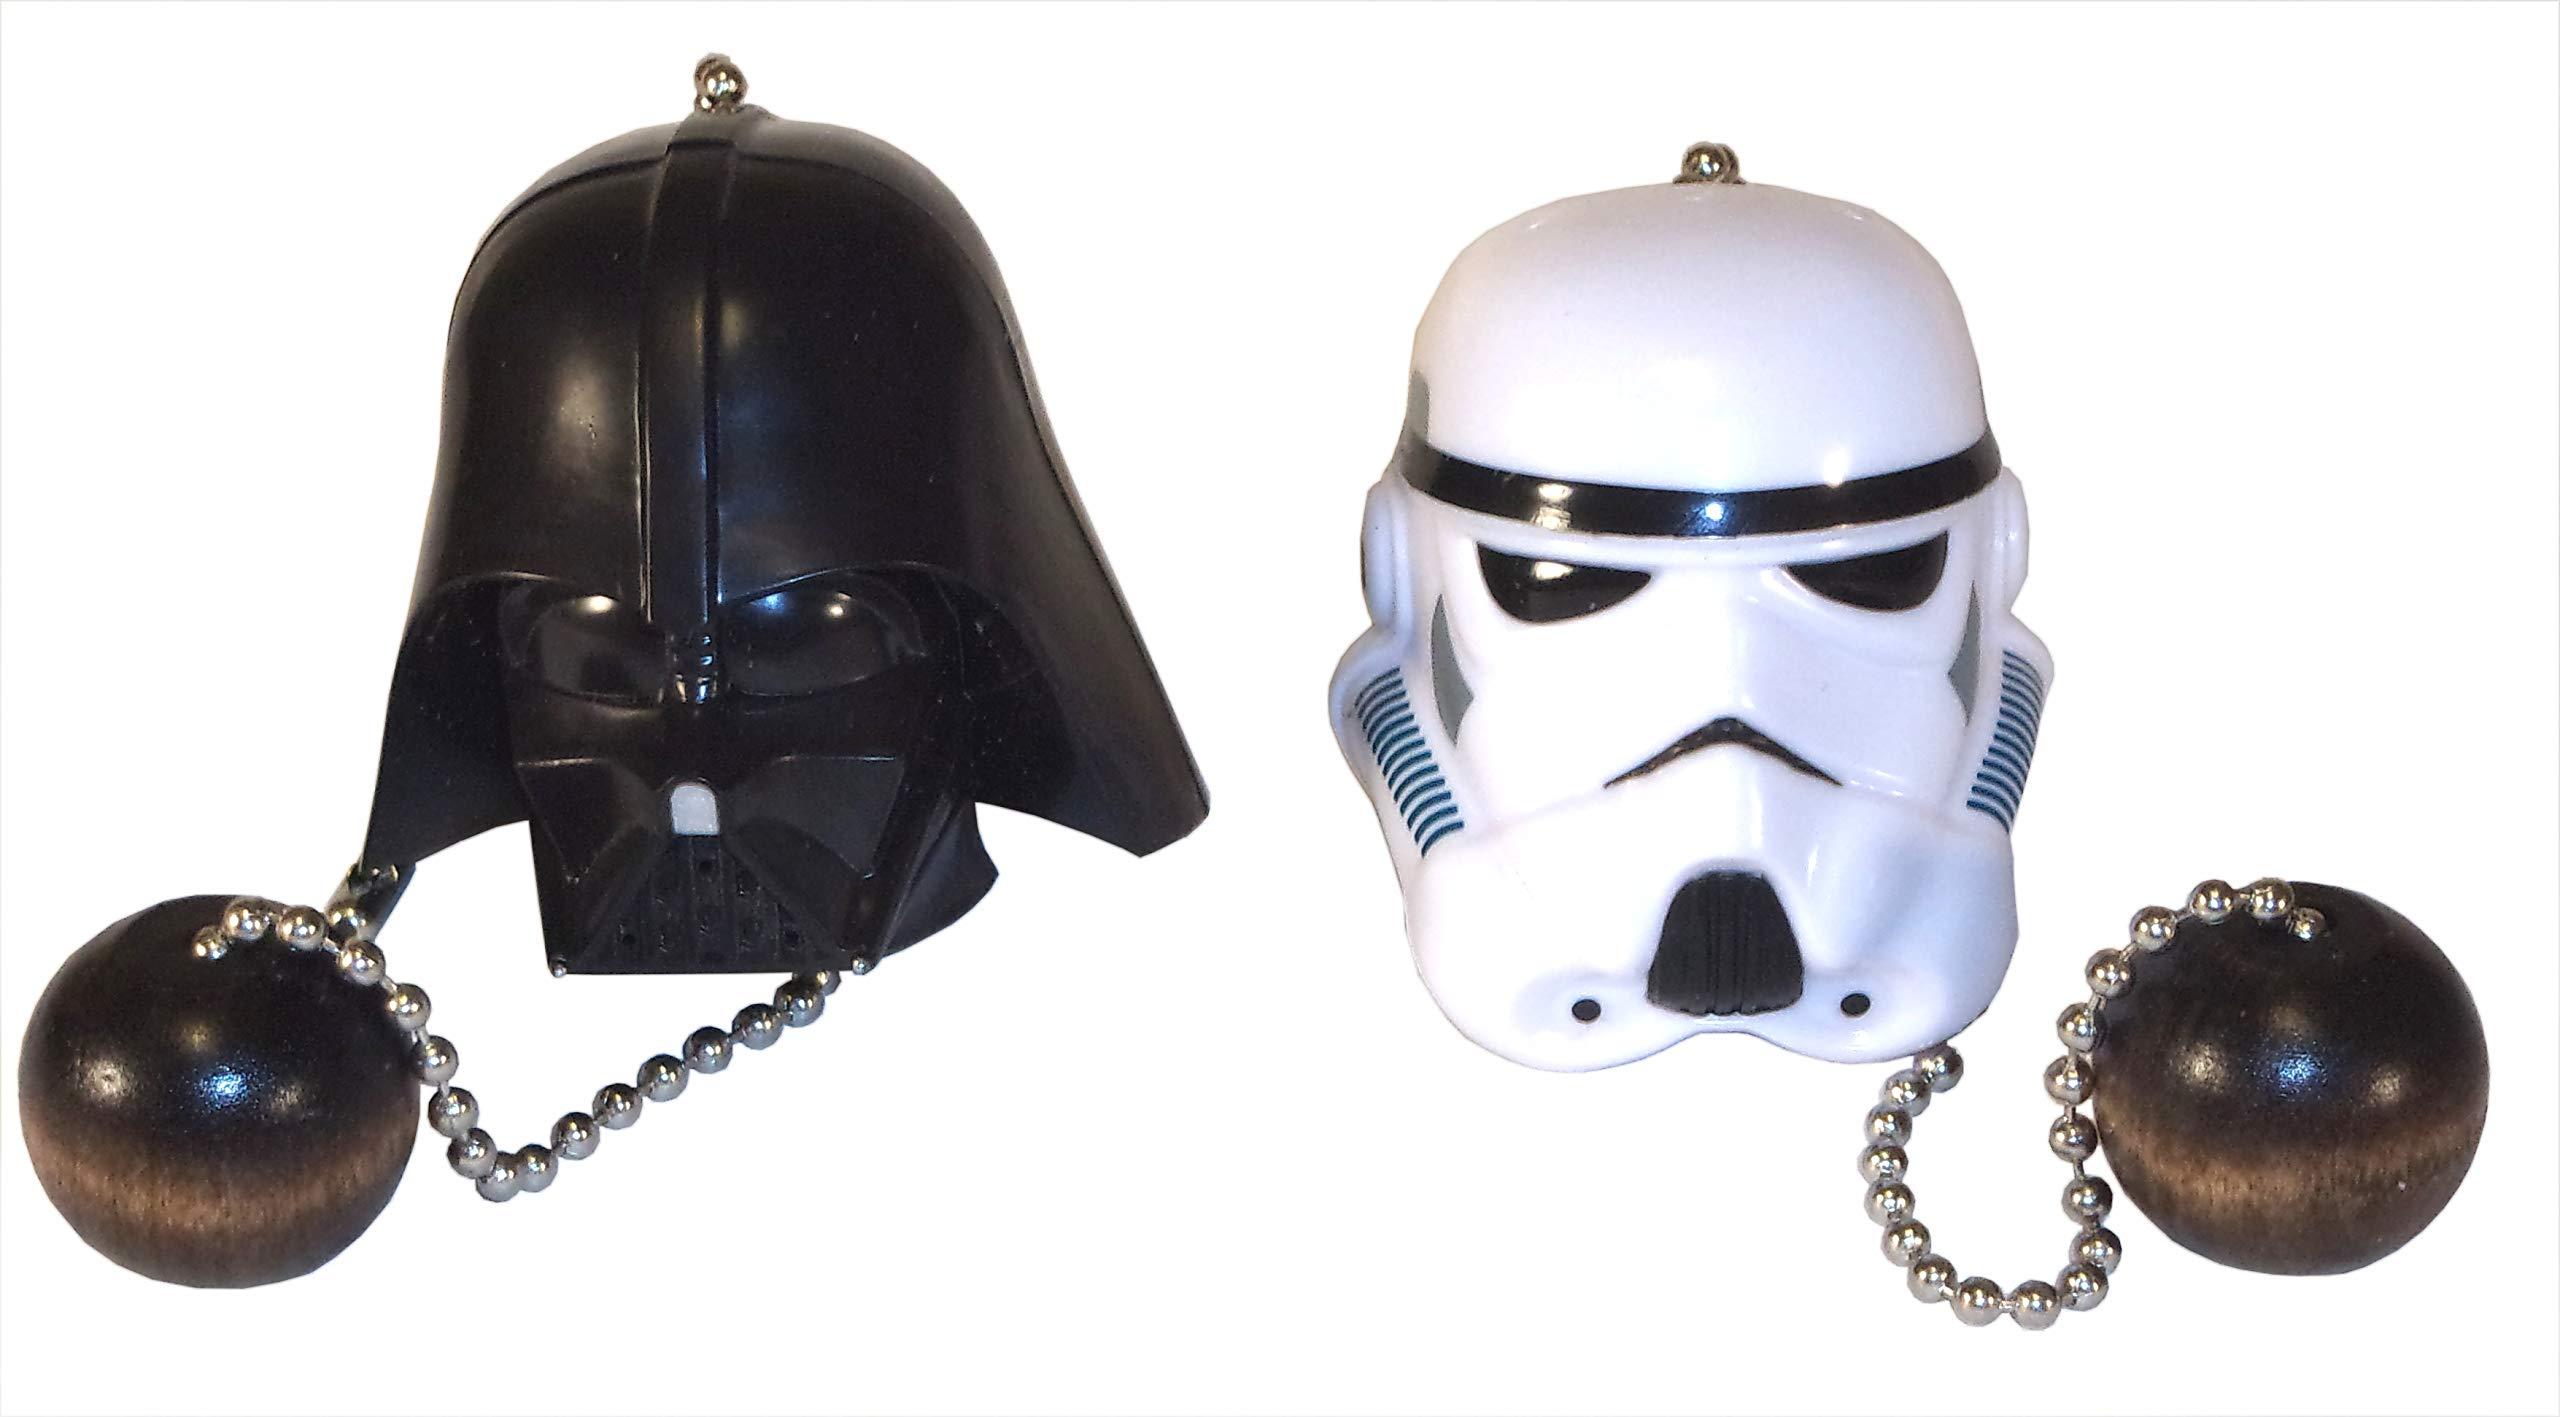 Darth Vader Storm Trooper Helmets Ceiling Fan Pull Set by Wooden Androyd Studio (Vader Trooper Helmet)